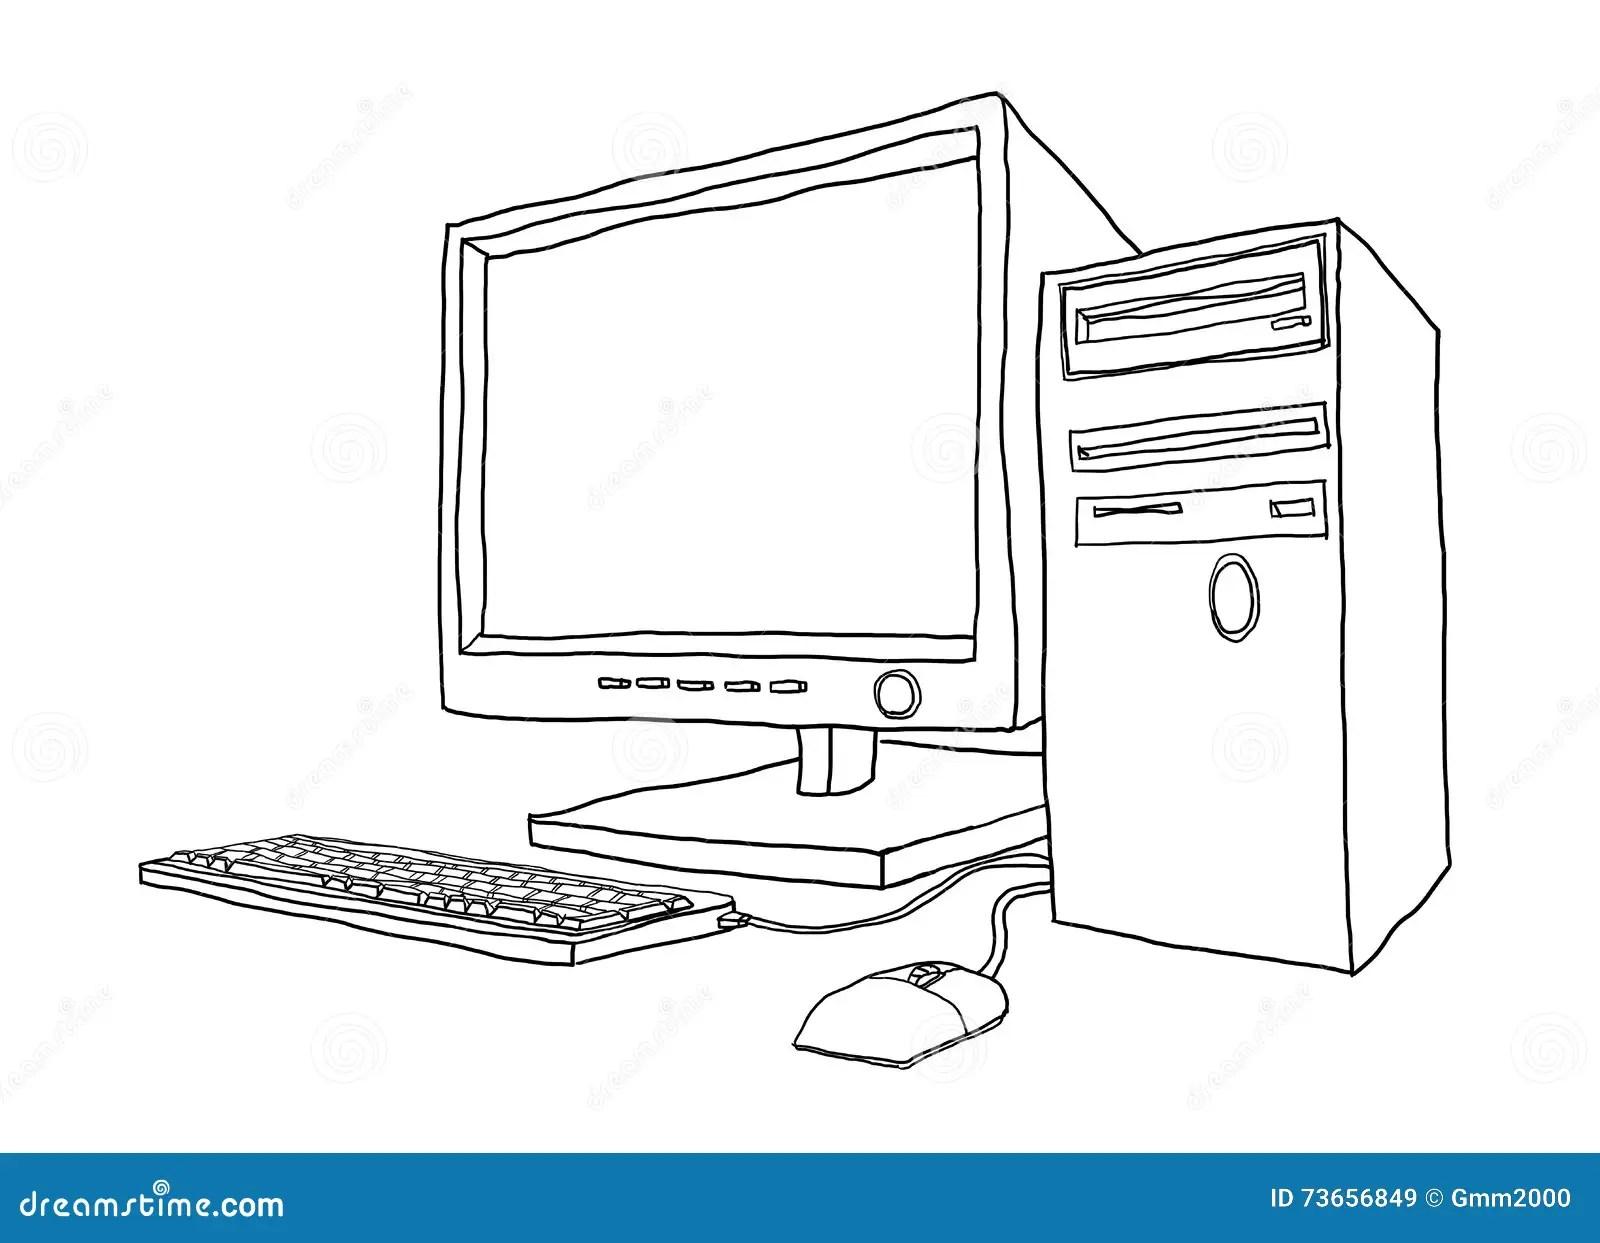 Desktop Computer Hand Drawn Line Art Painting Cute